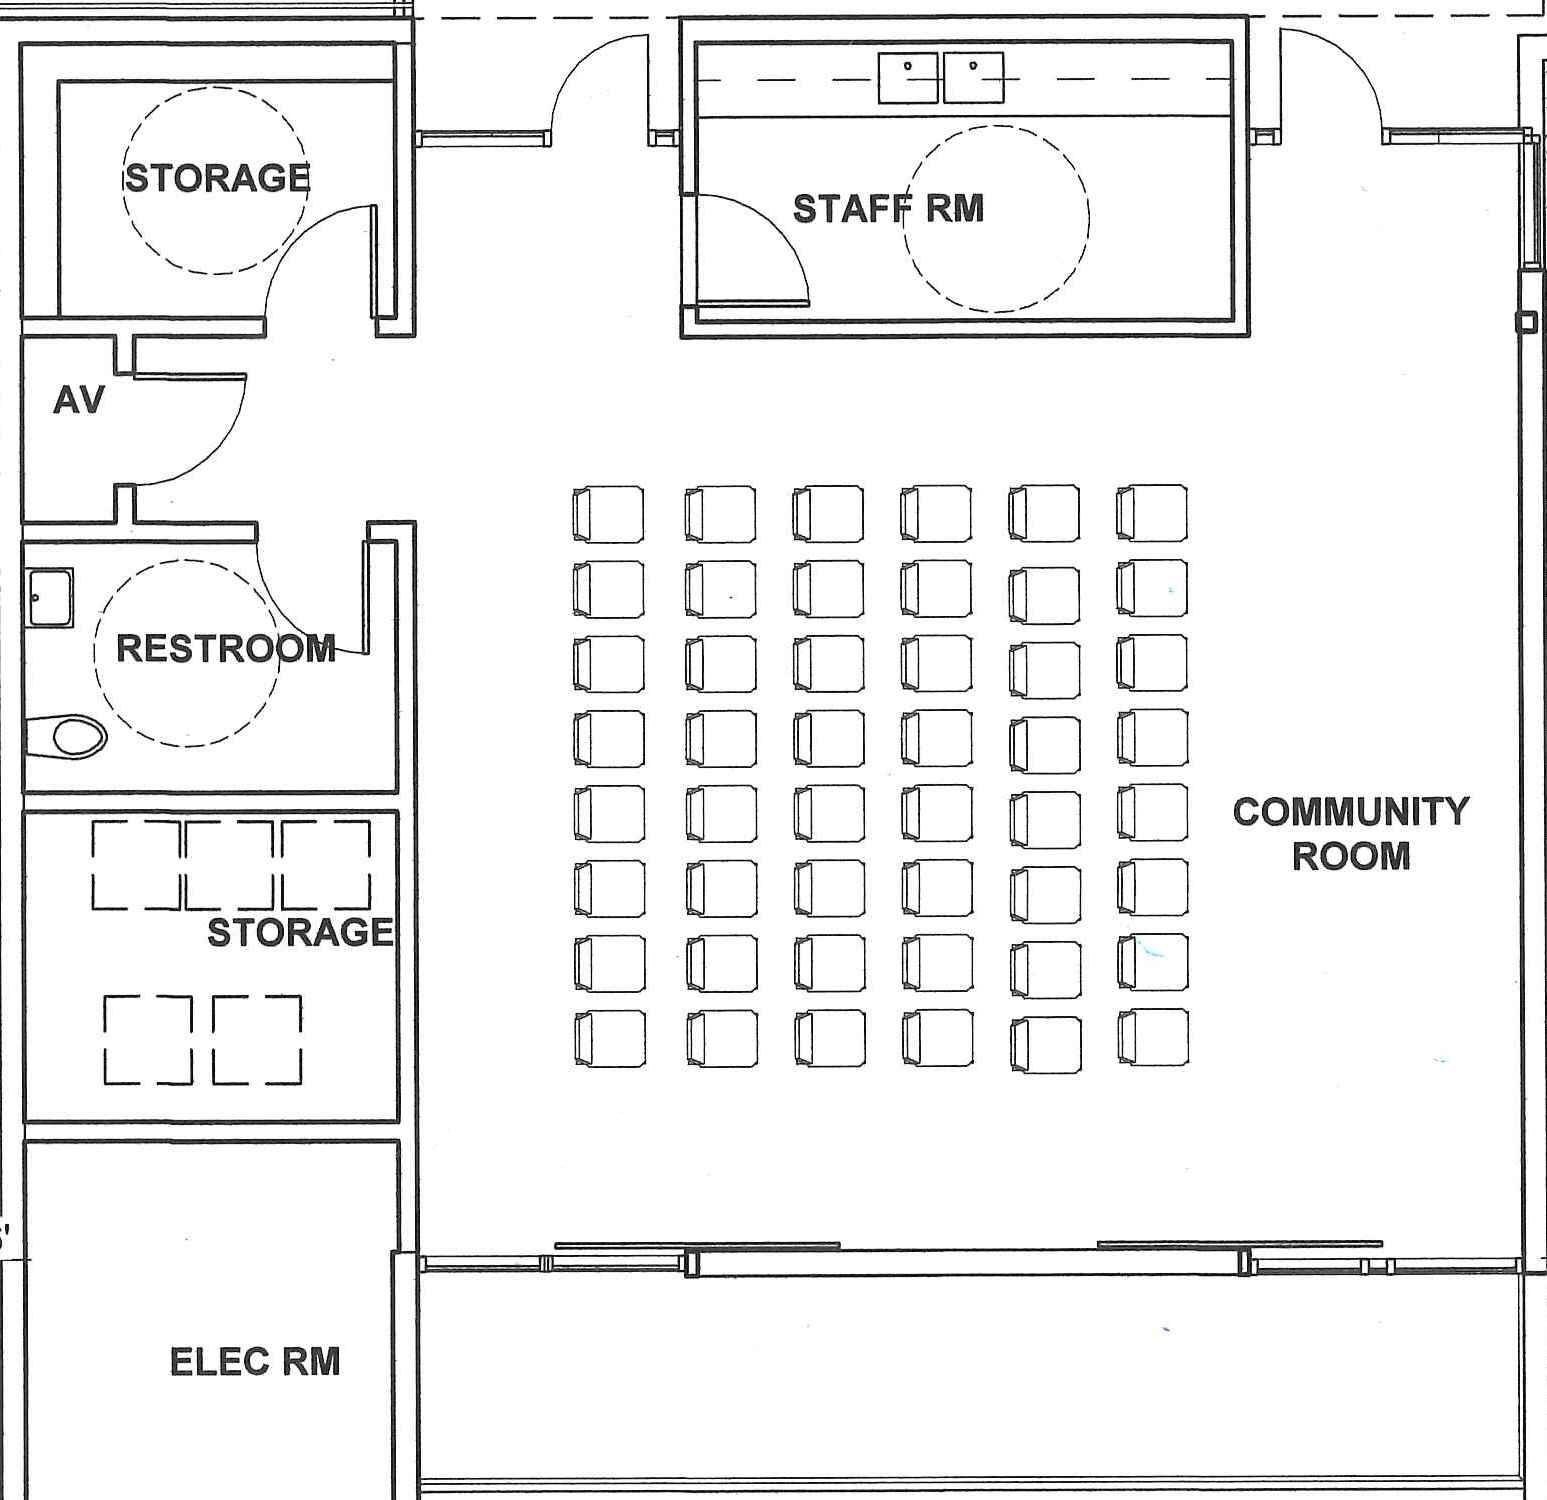 Santa Monica Public Library - Annex Community Meeting Facility